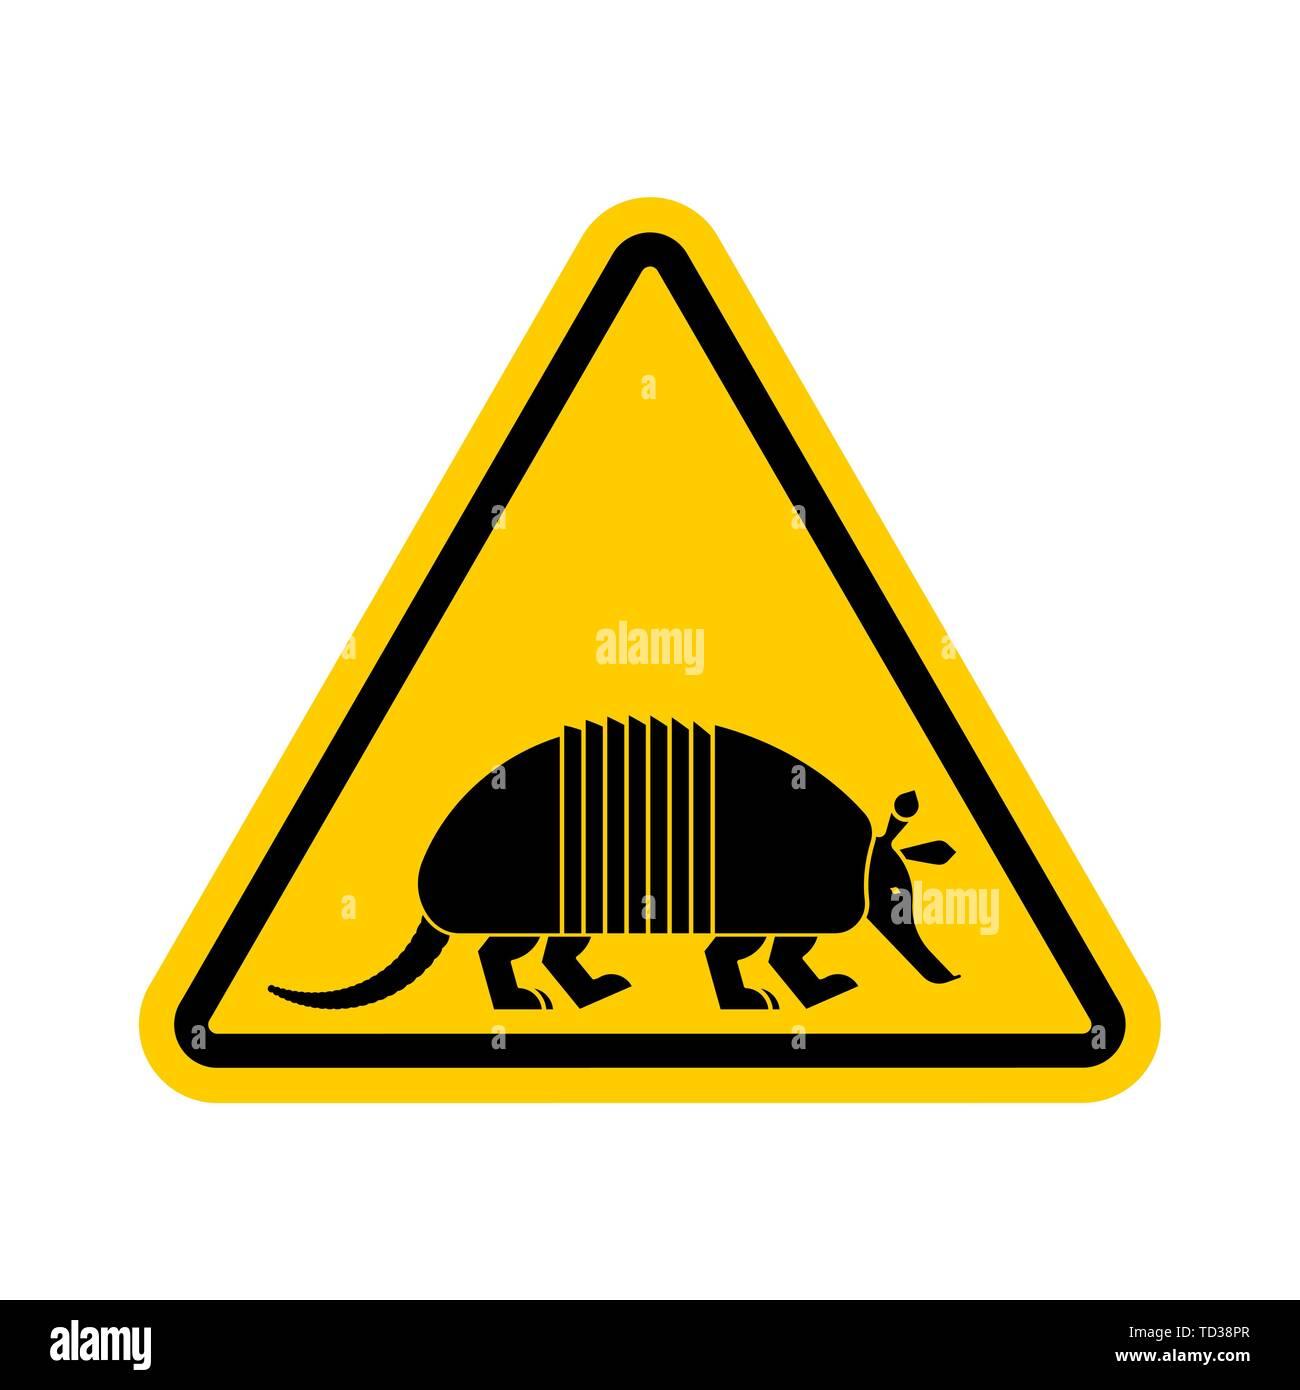 Attention armadillo. Caution Nine-hip Armadillo. Yellow triangle road sign - Stock Image